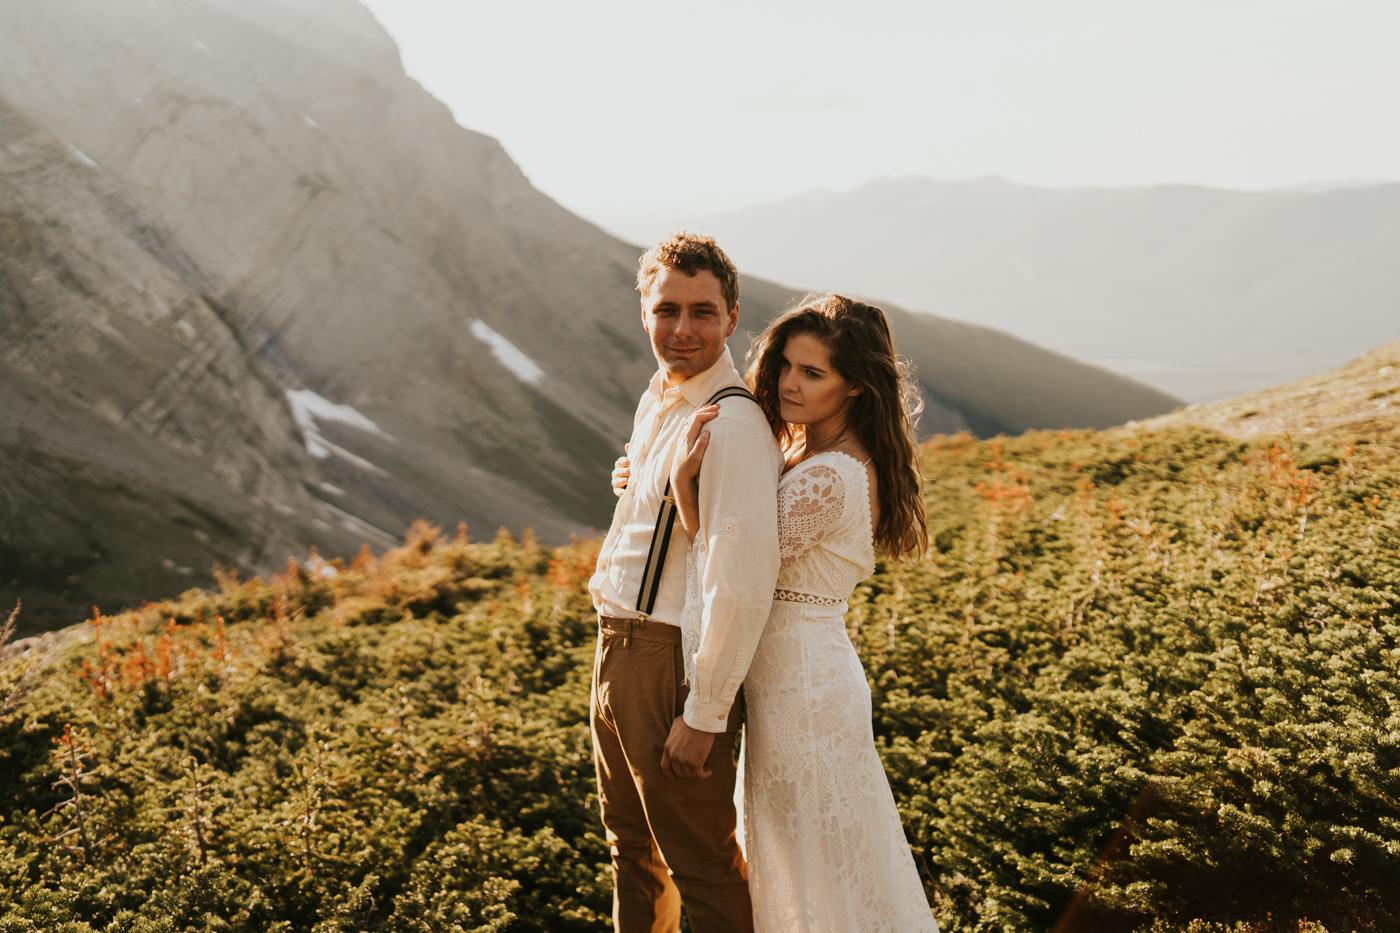 tyraephotography_photographer_wedding_elopement_engagement_photography-08378.jpg